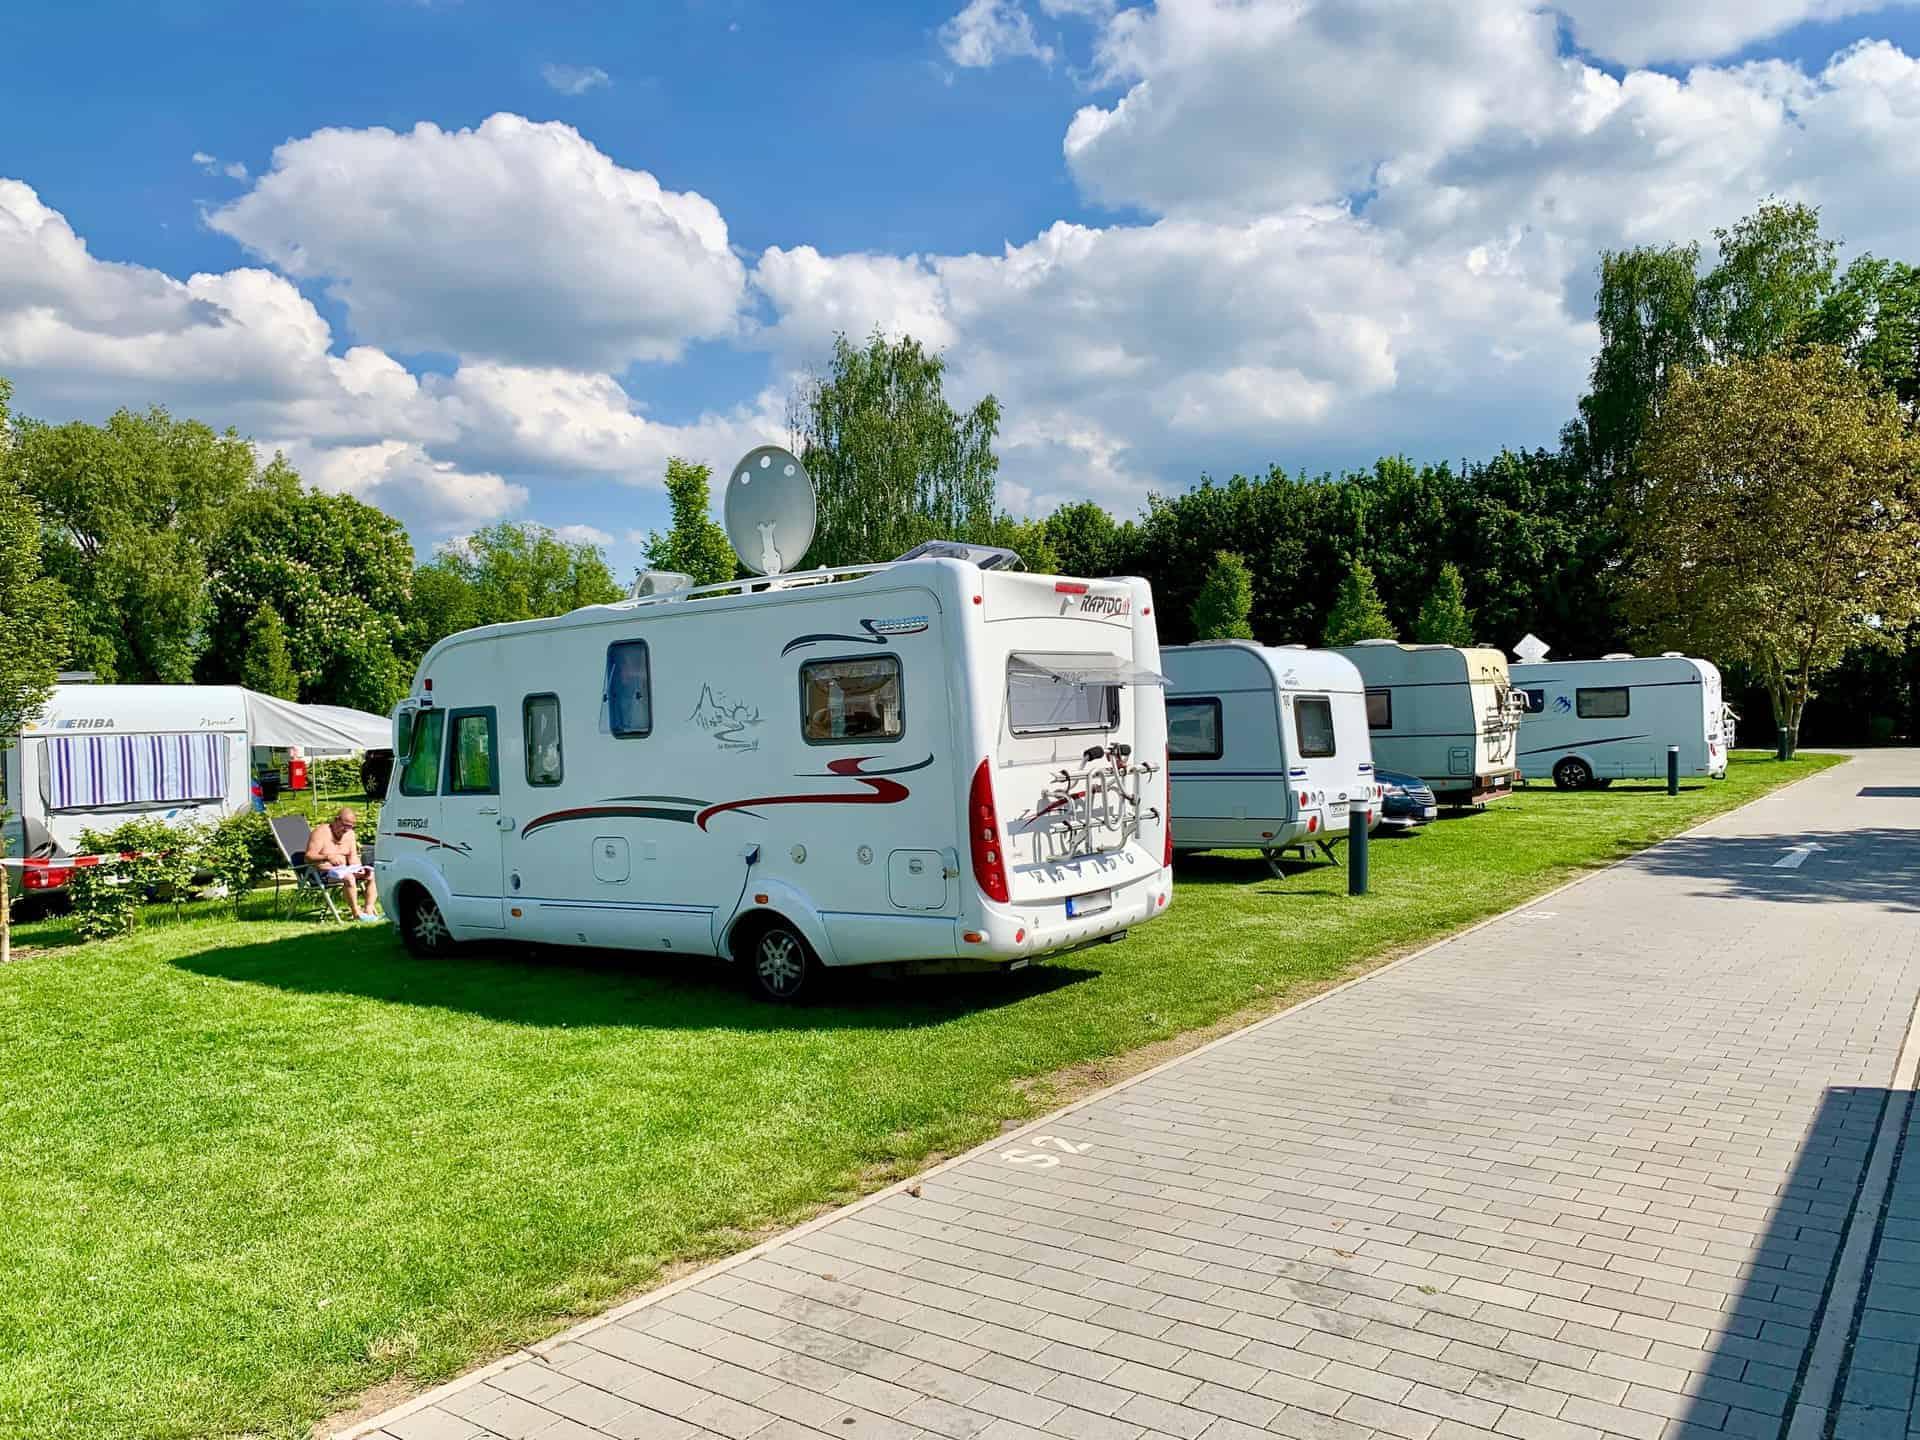 Kassel_Campingplatz_Stellplatz_Parzelle